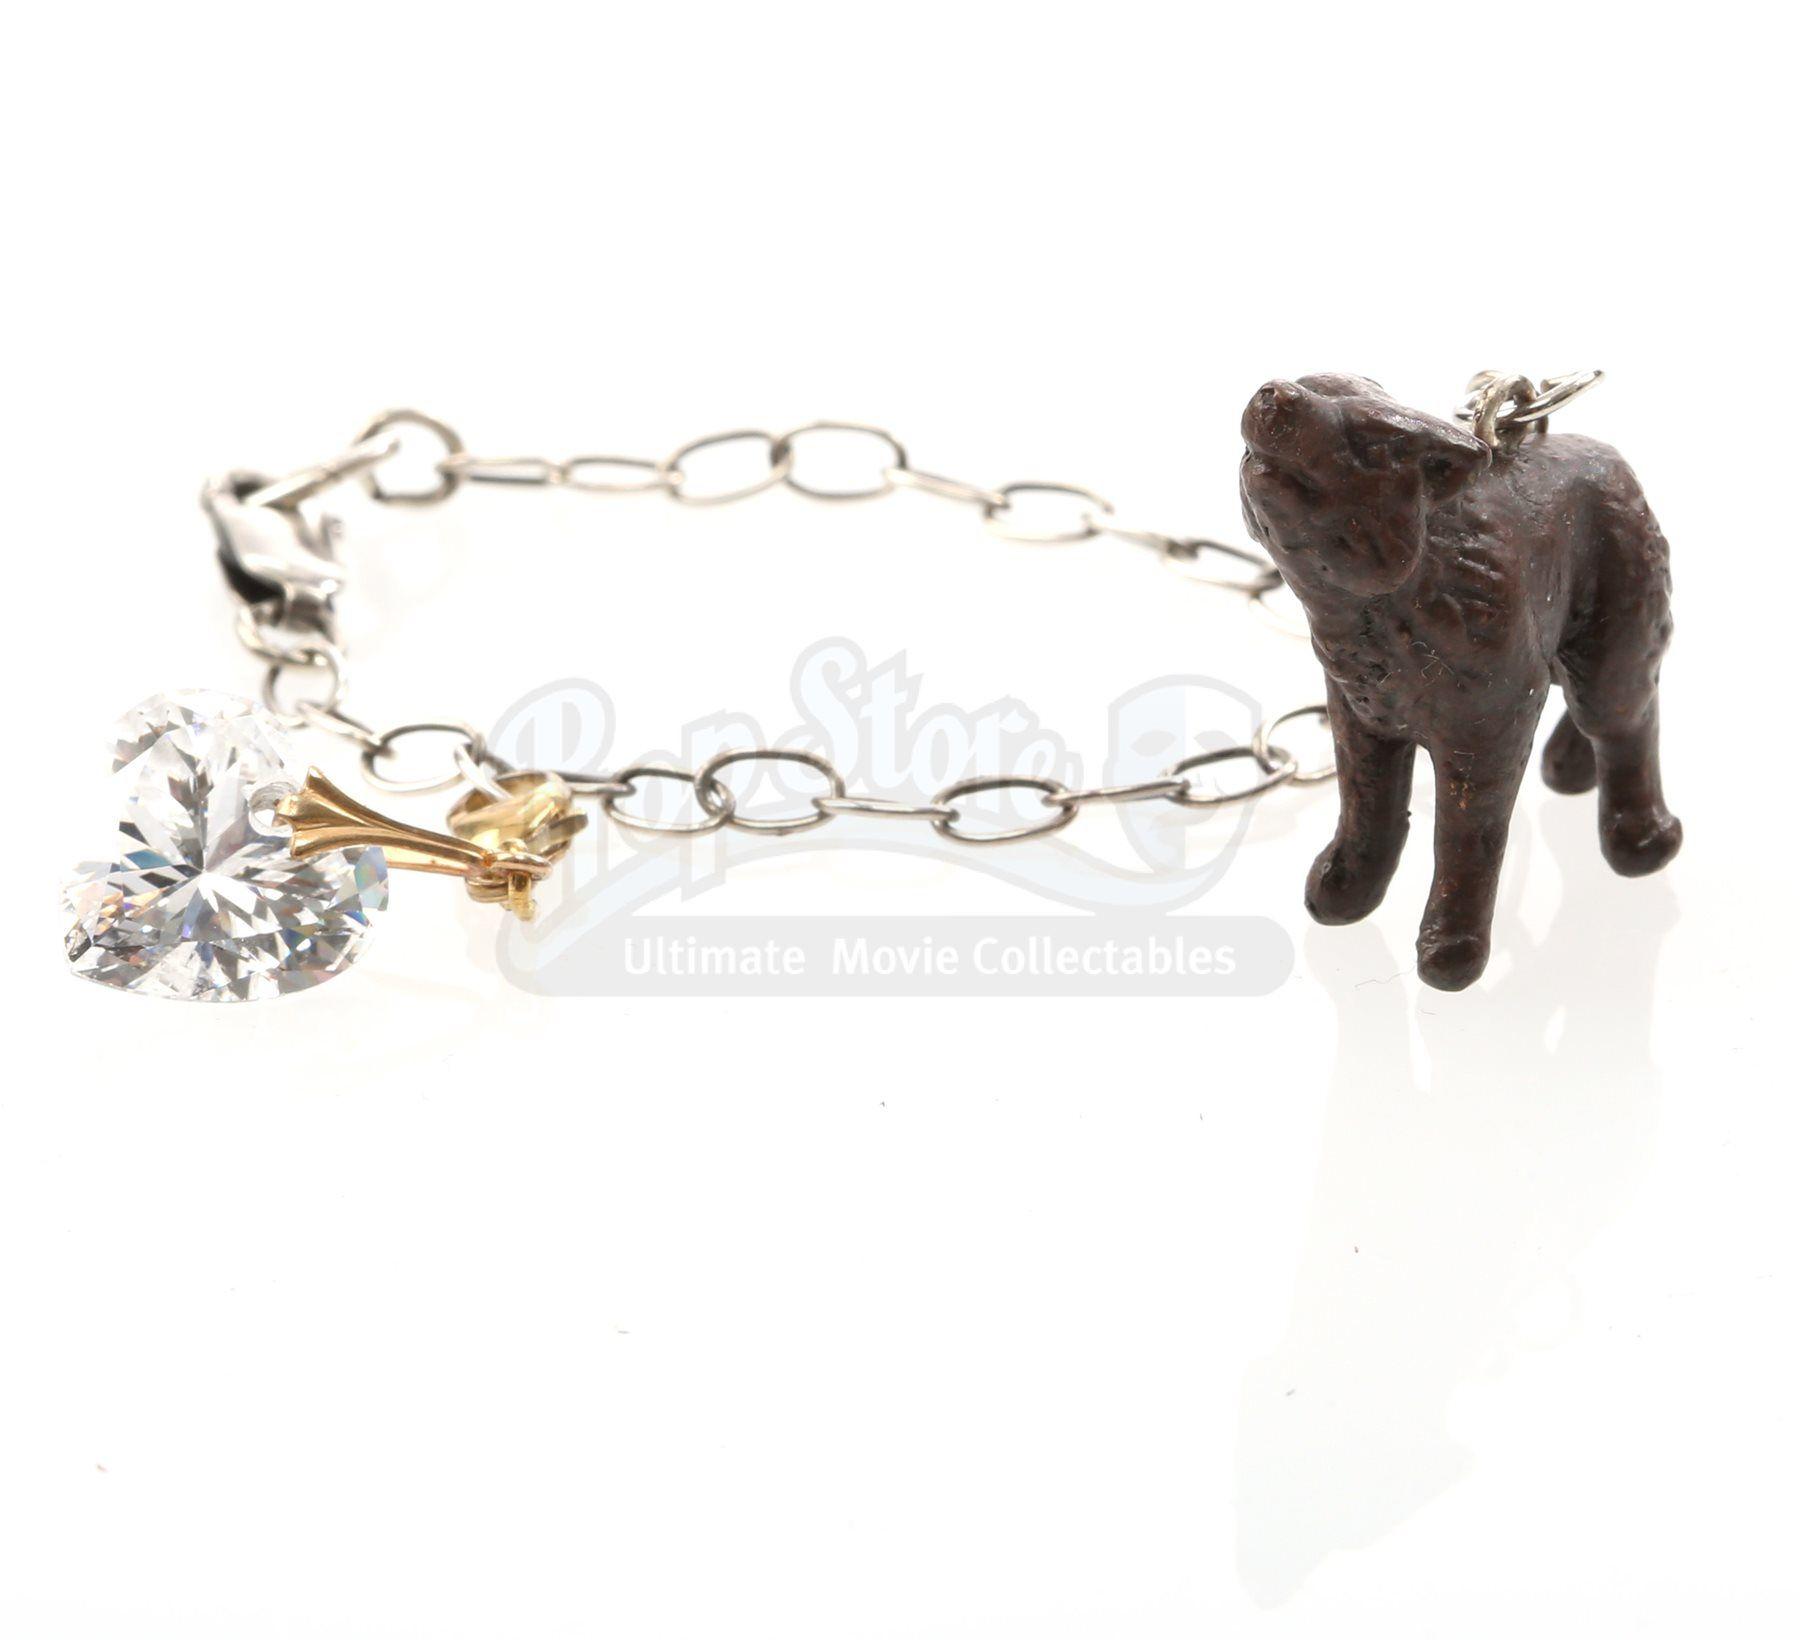 Bella Swan's Charm Bracelet - Current price: $5500